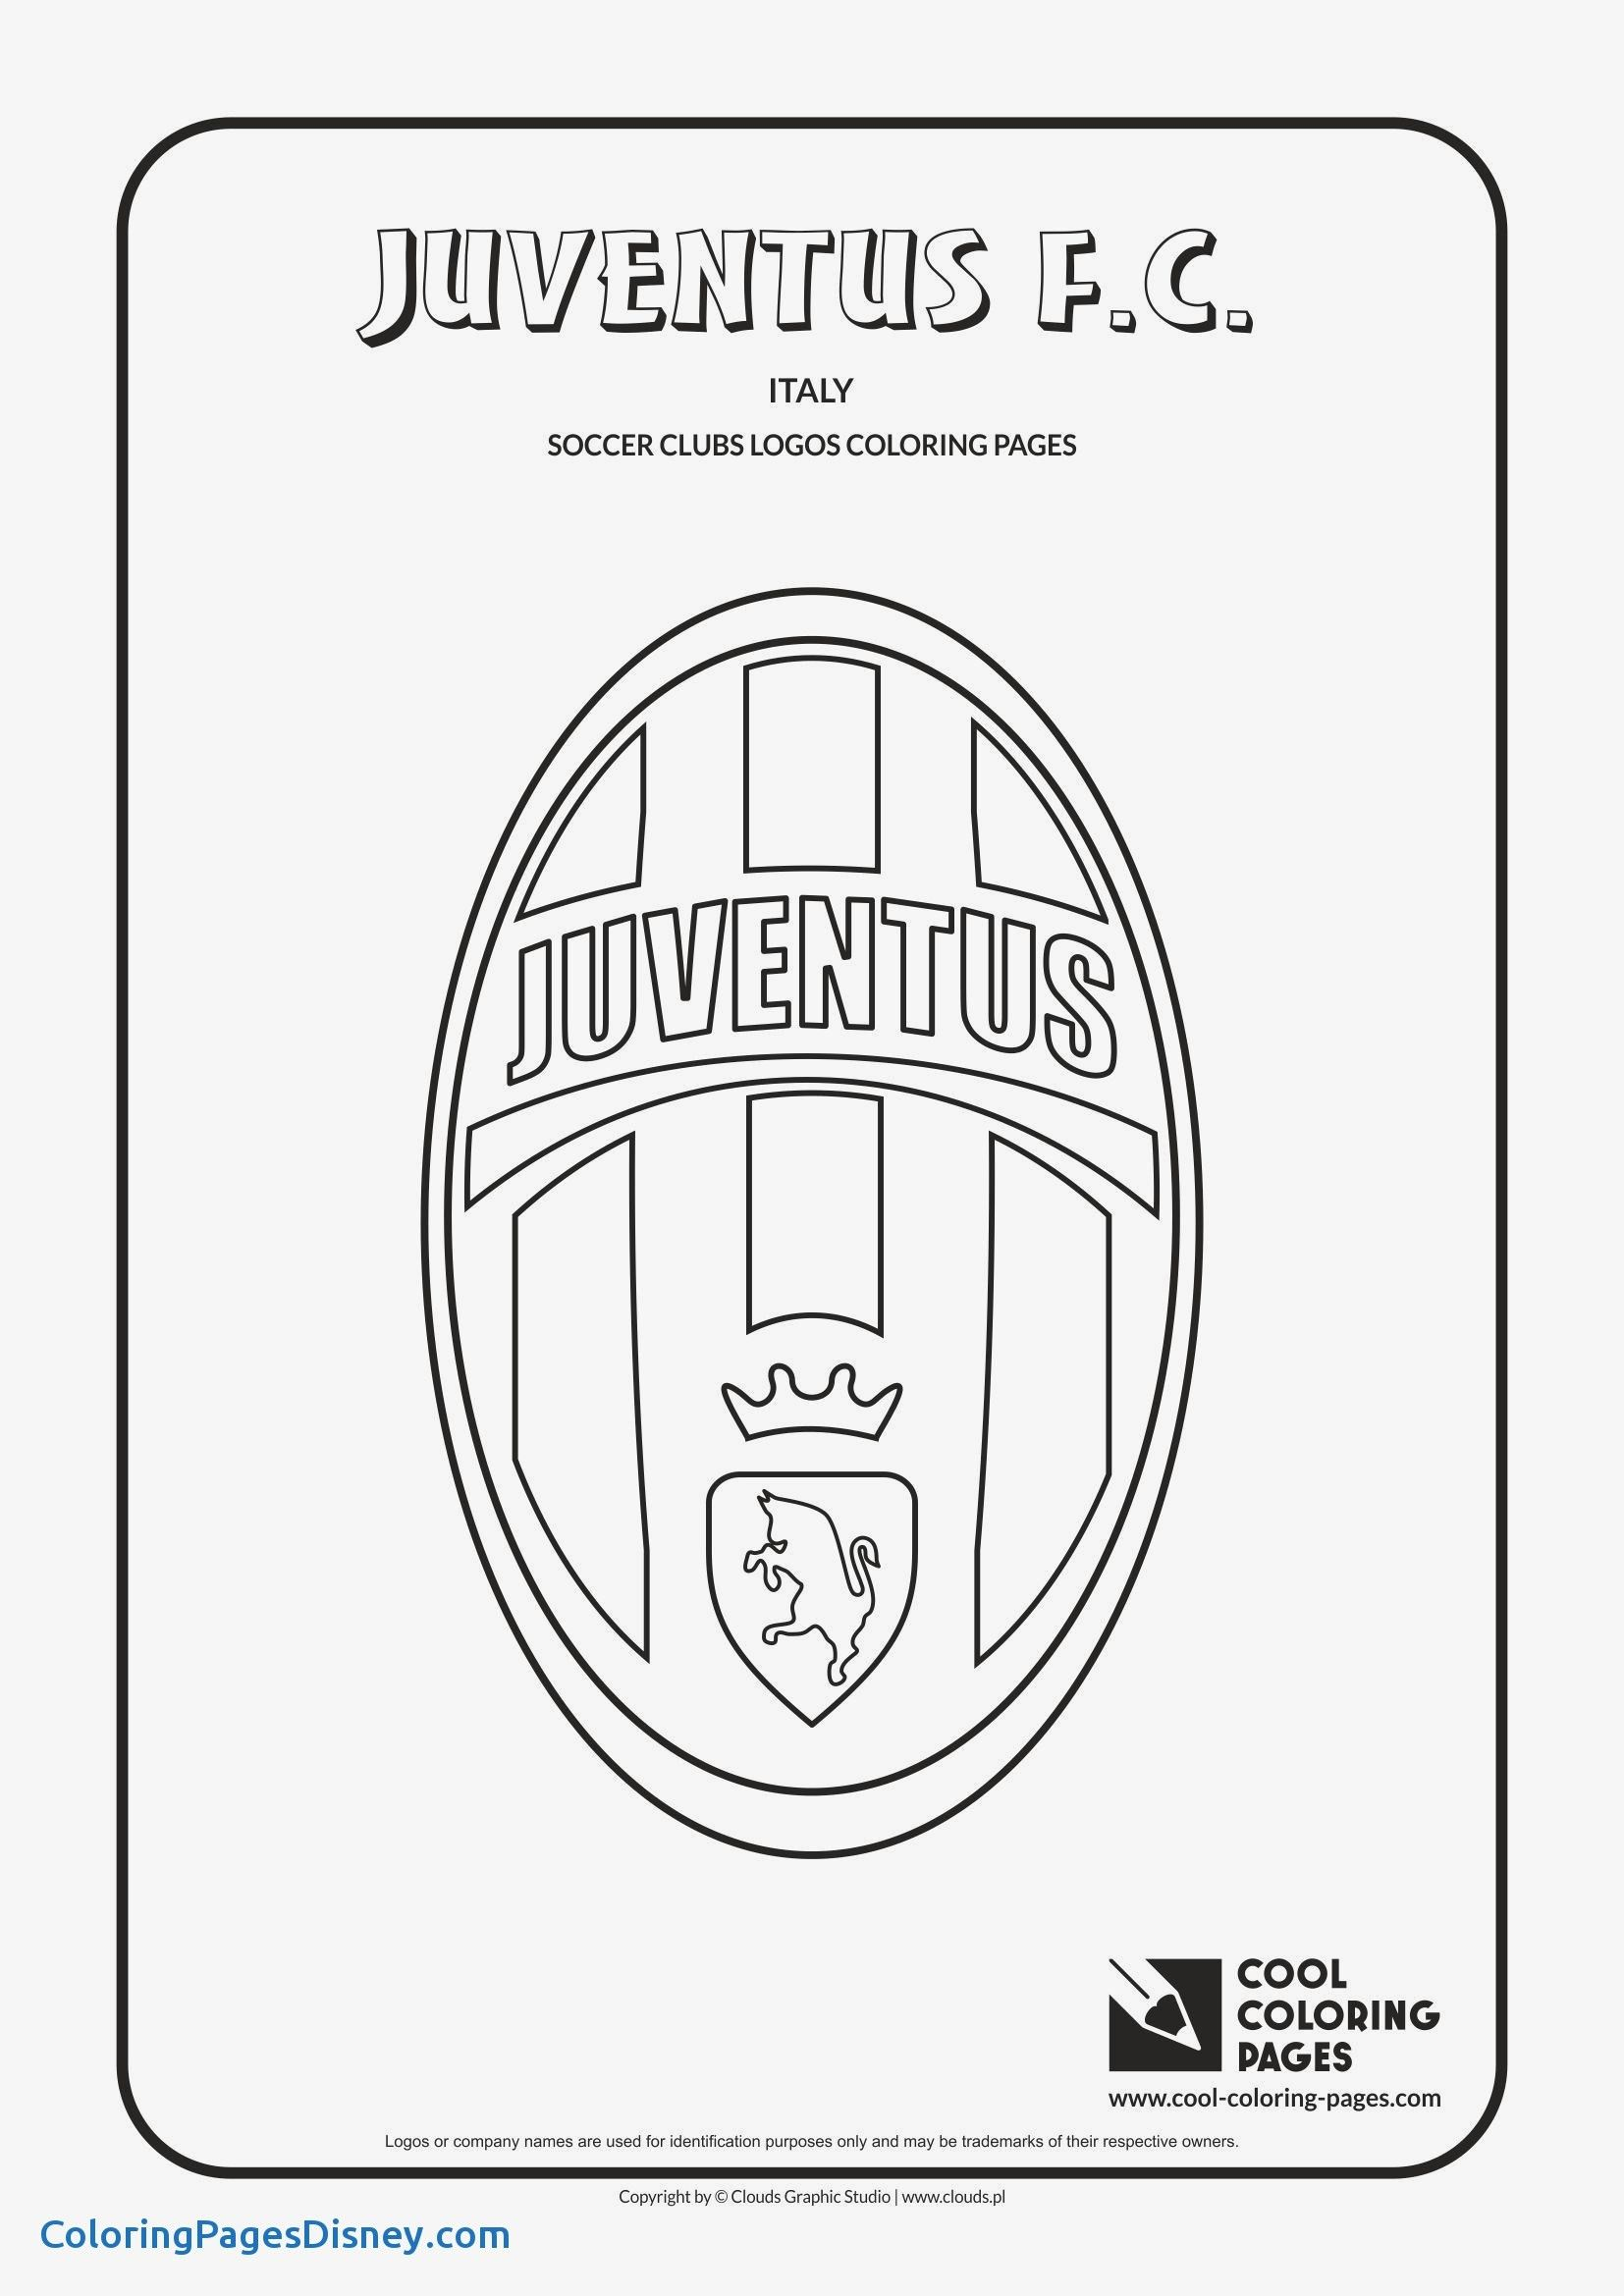 10 Images Of Soccer Logo Coloring Pages Coloring Images Pages Soccer Futbol Para Colorear Escudos De Equipos Carta A Los Reyes